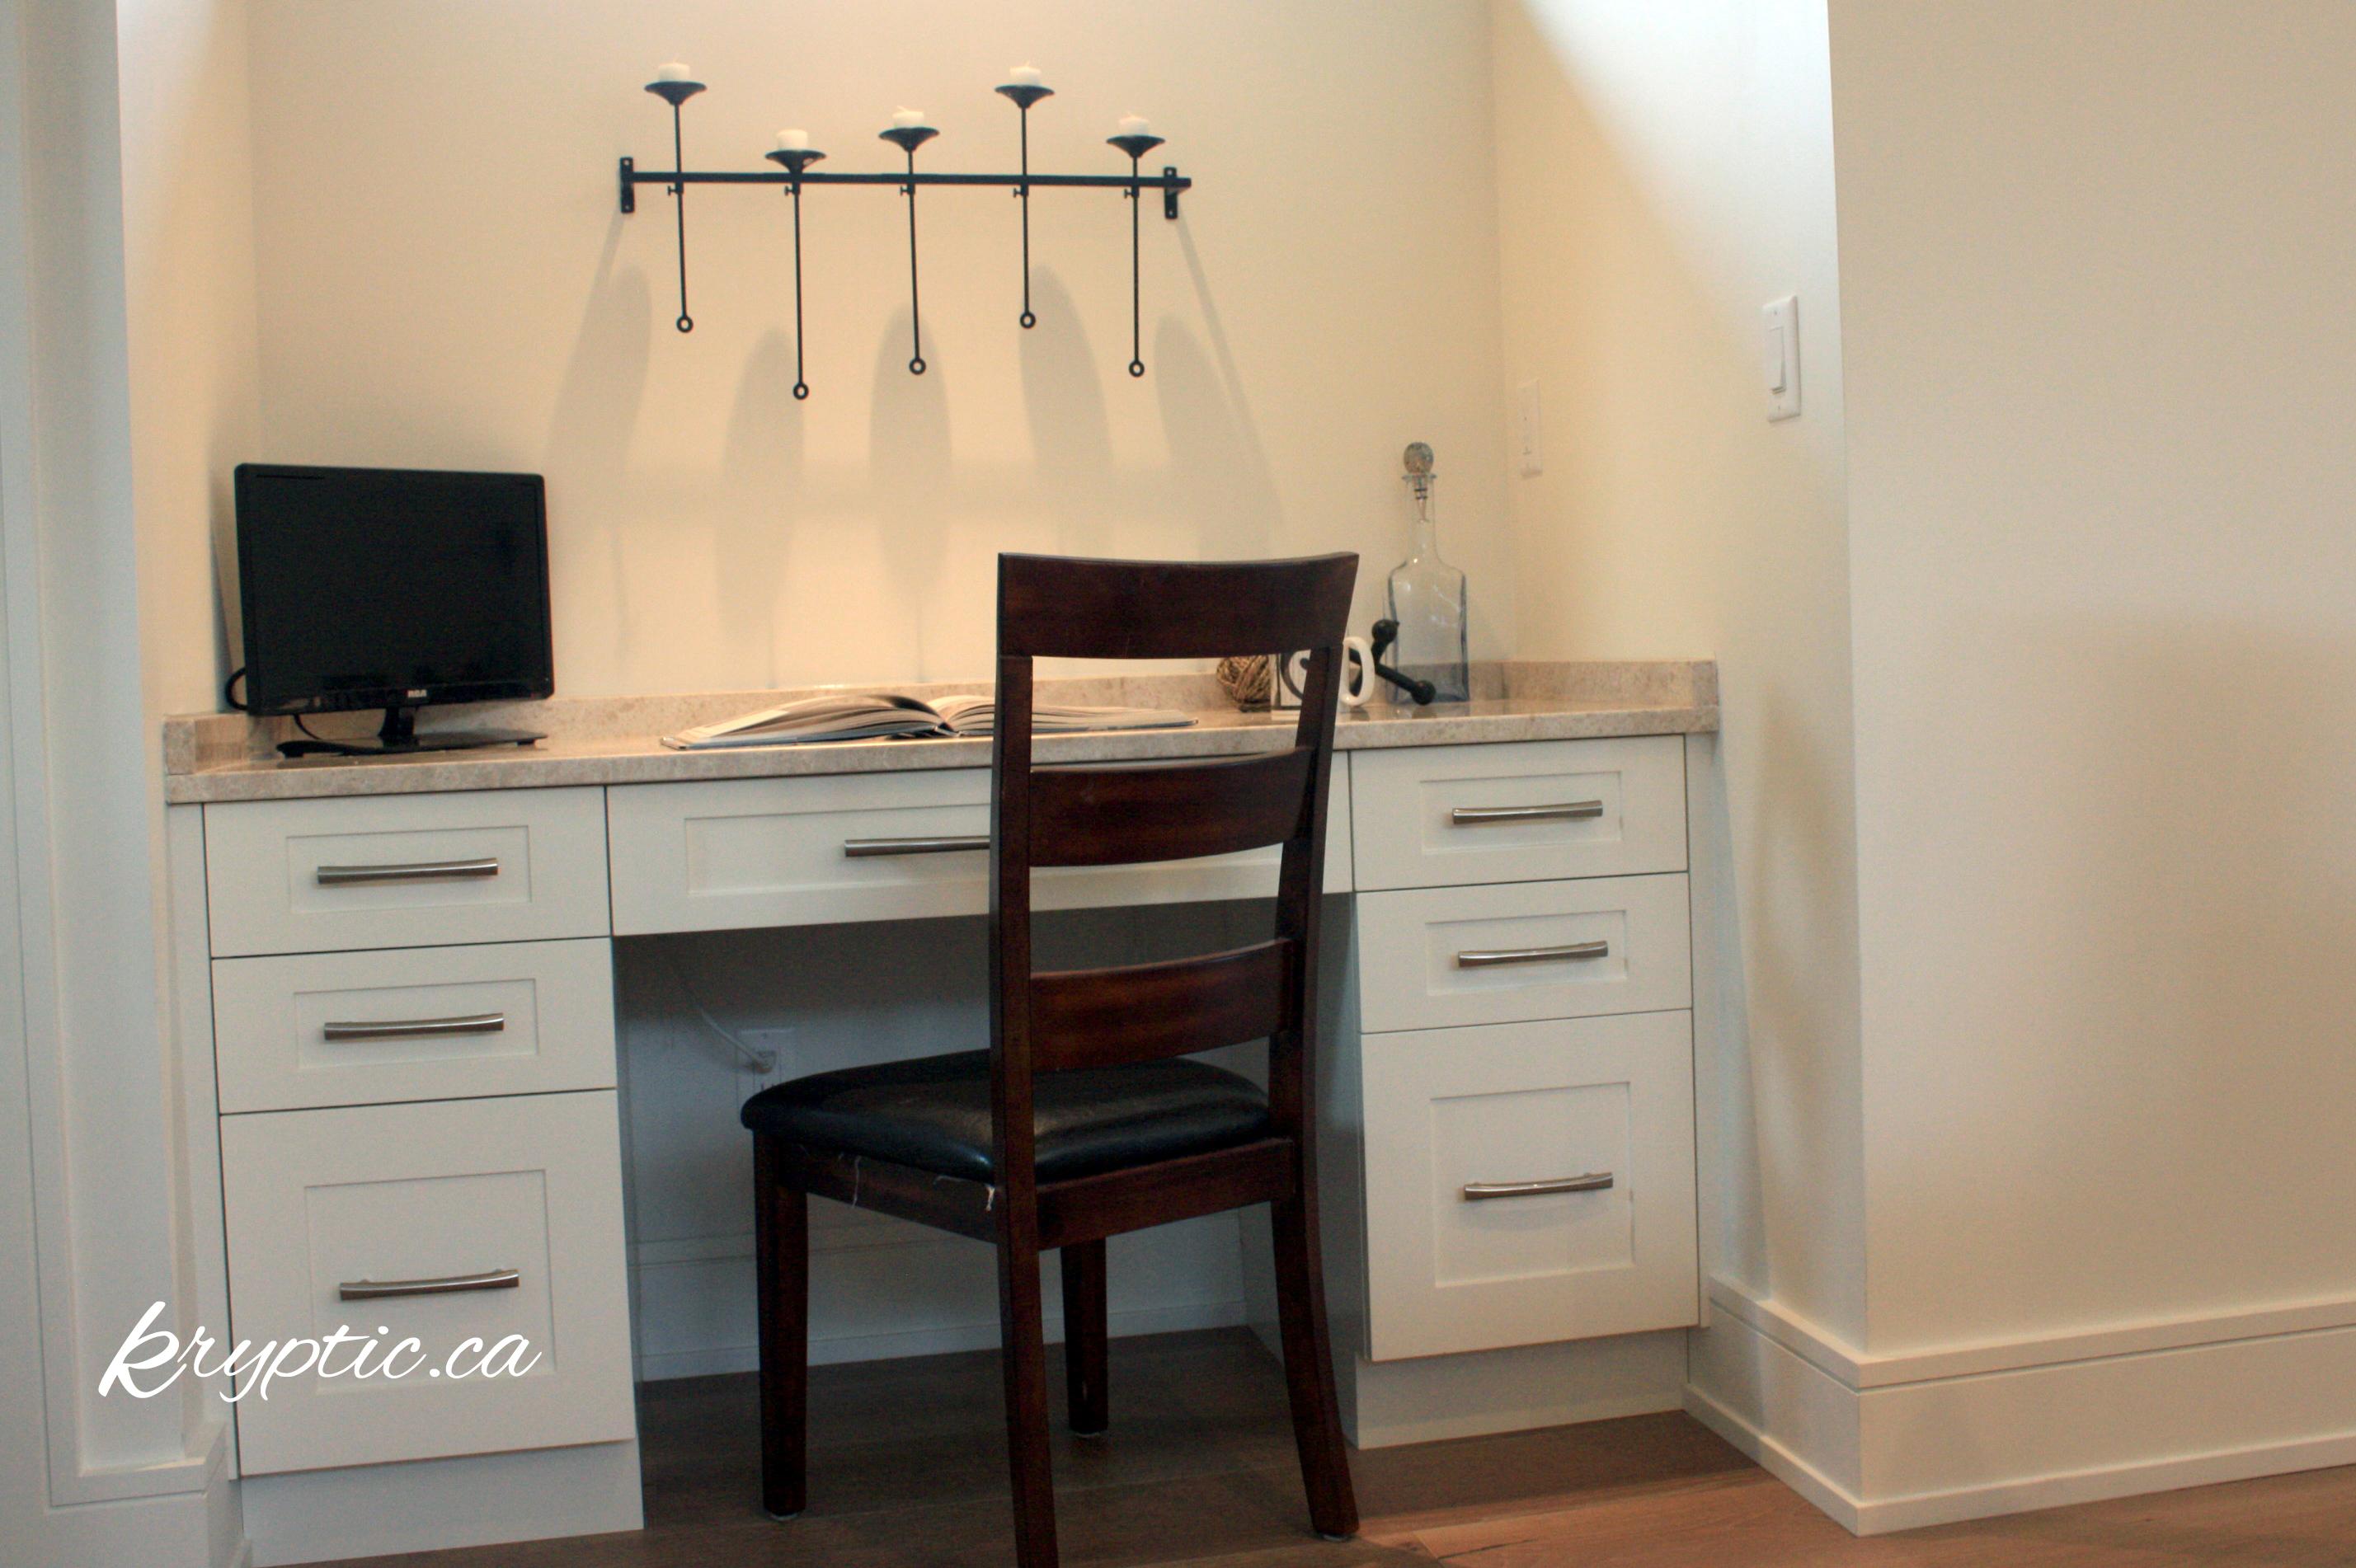 inc nook creative kelowna design portfolio home interior kitchen remodel page heritage interiors desk touch